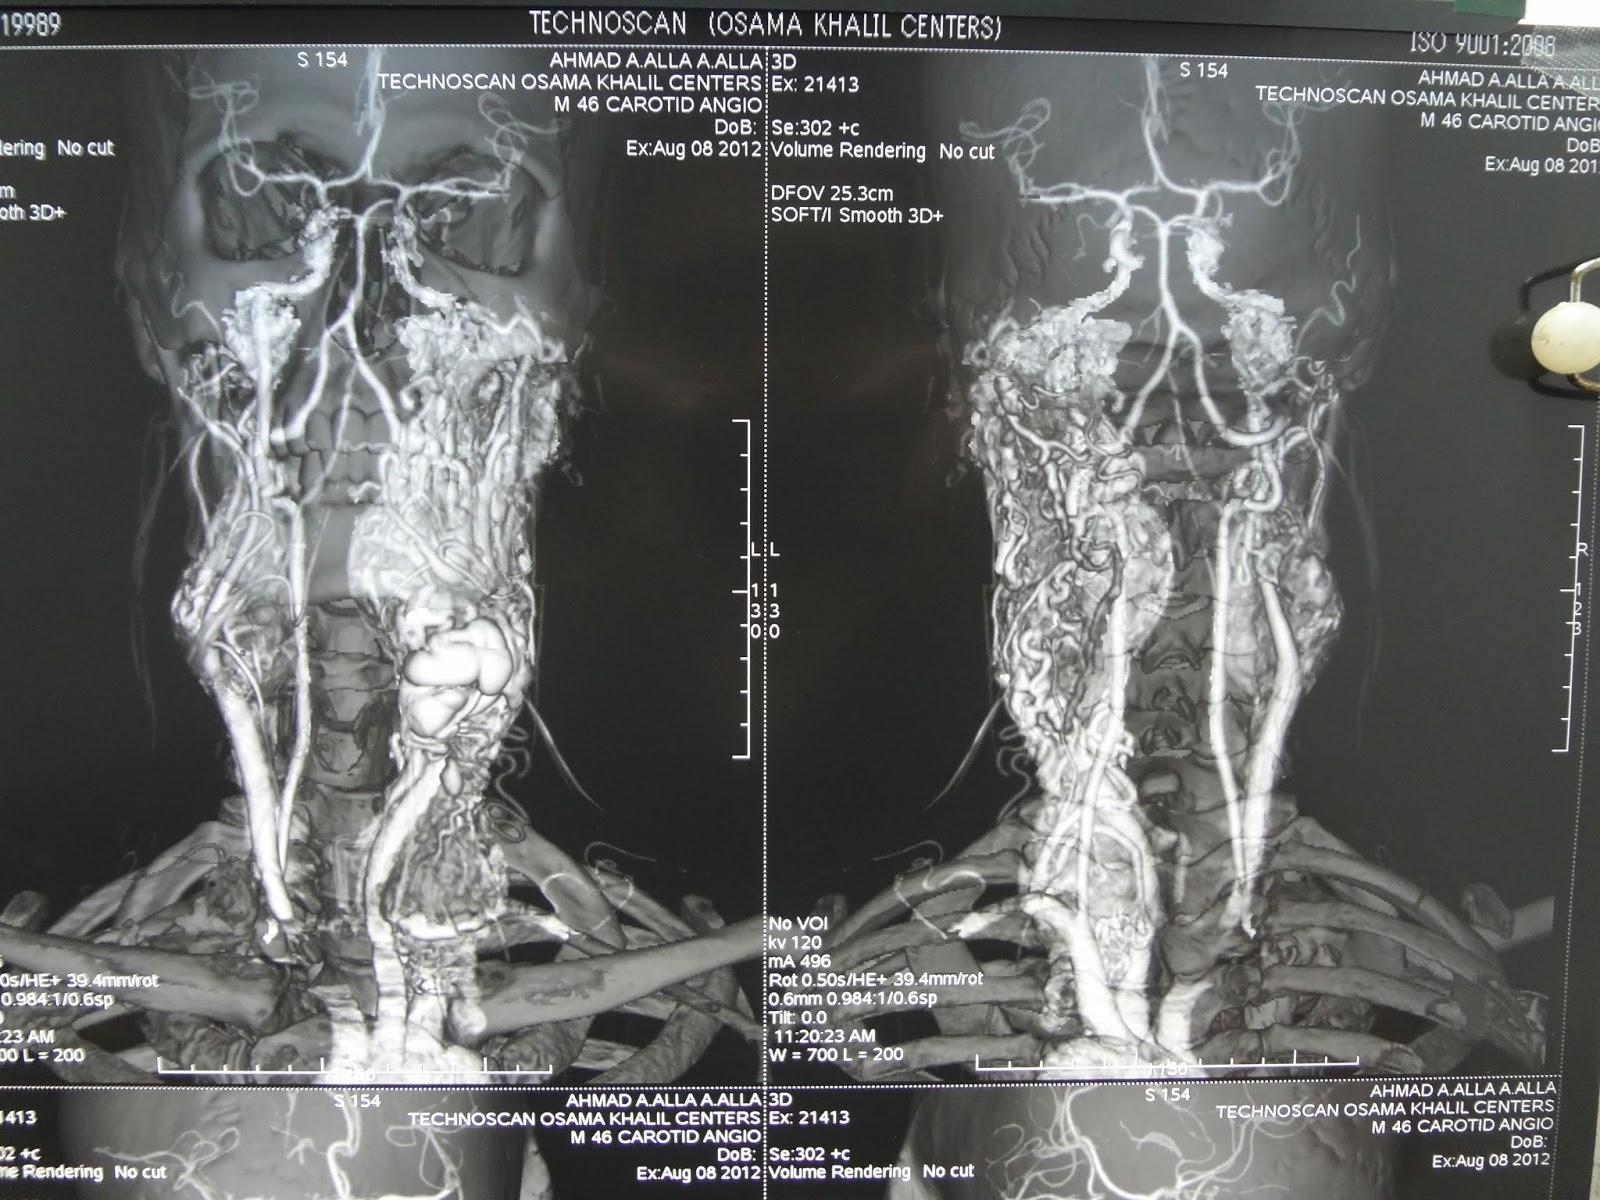 radiology ENT, Maxillofacial, Head and neck, neurosurgery, Dentology ...